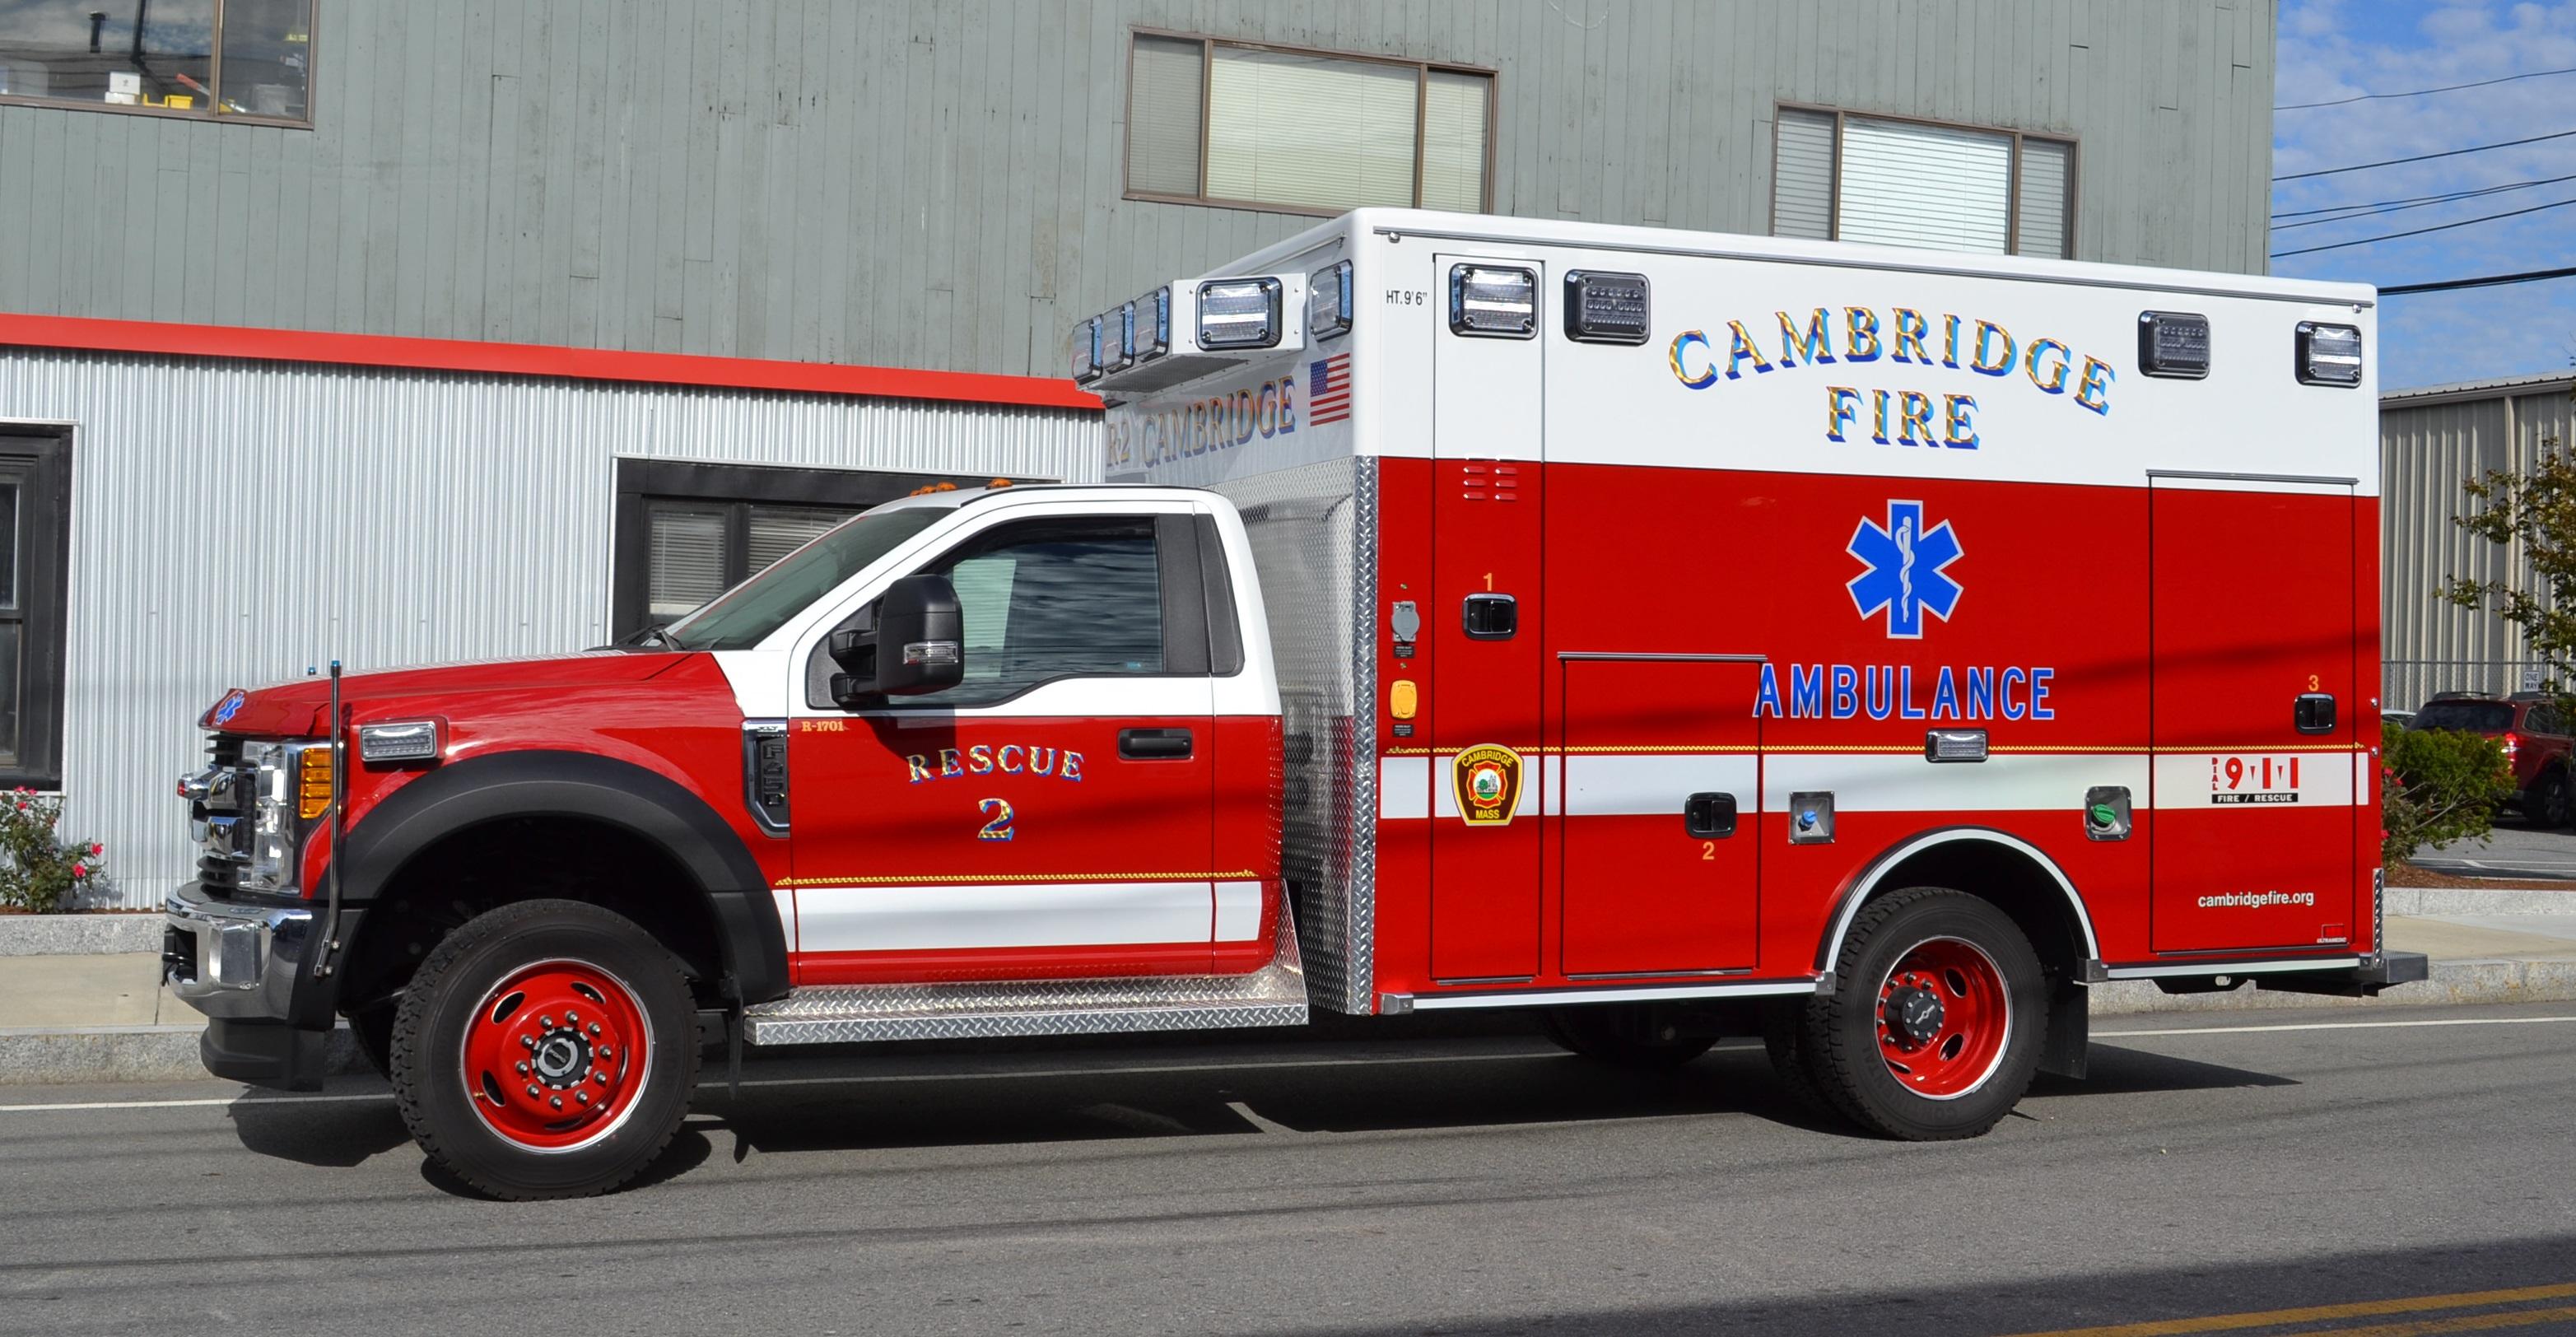 Special Units Fire Department City Of Cambridge Massachusetts